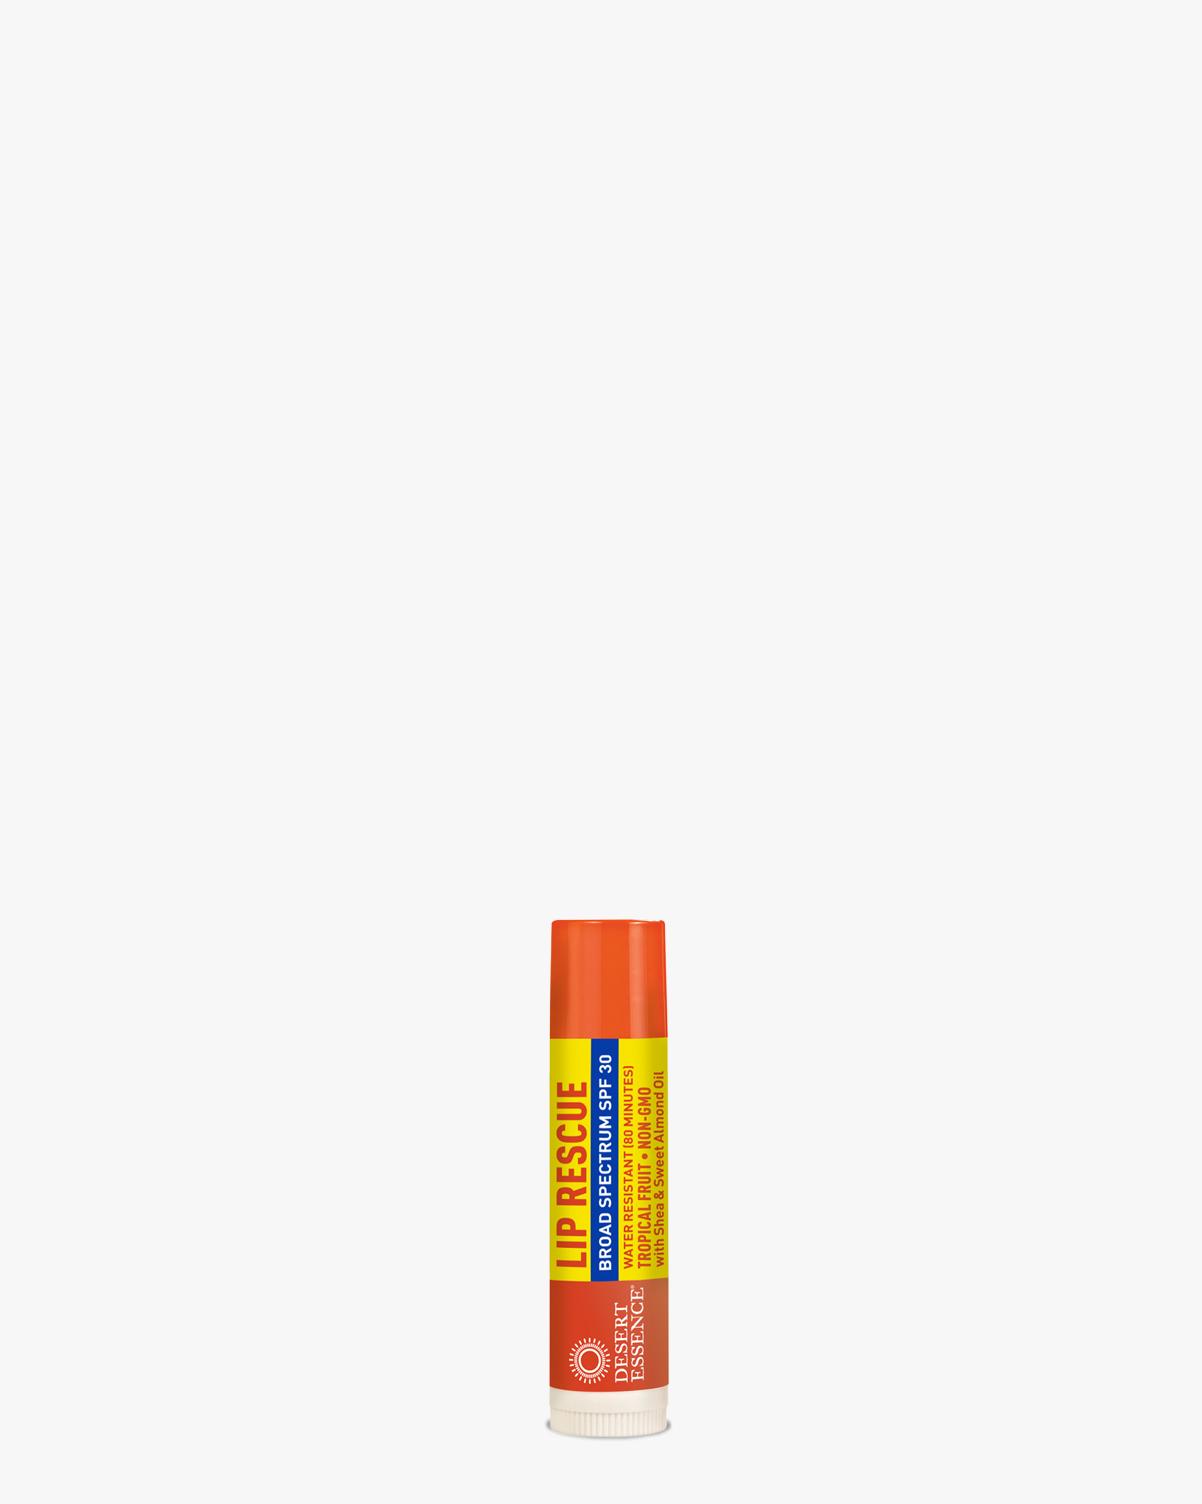 Desert Essence coupon: Desert Essence Lip Rescue SPF 30 - Tropical Fruit Balm | Gluten-Free